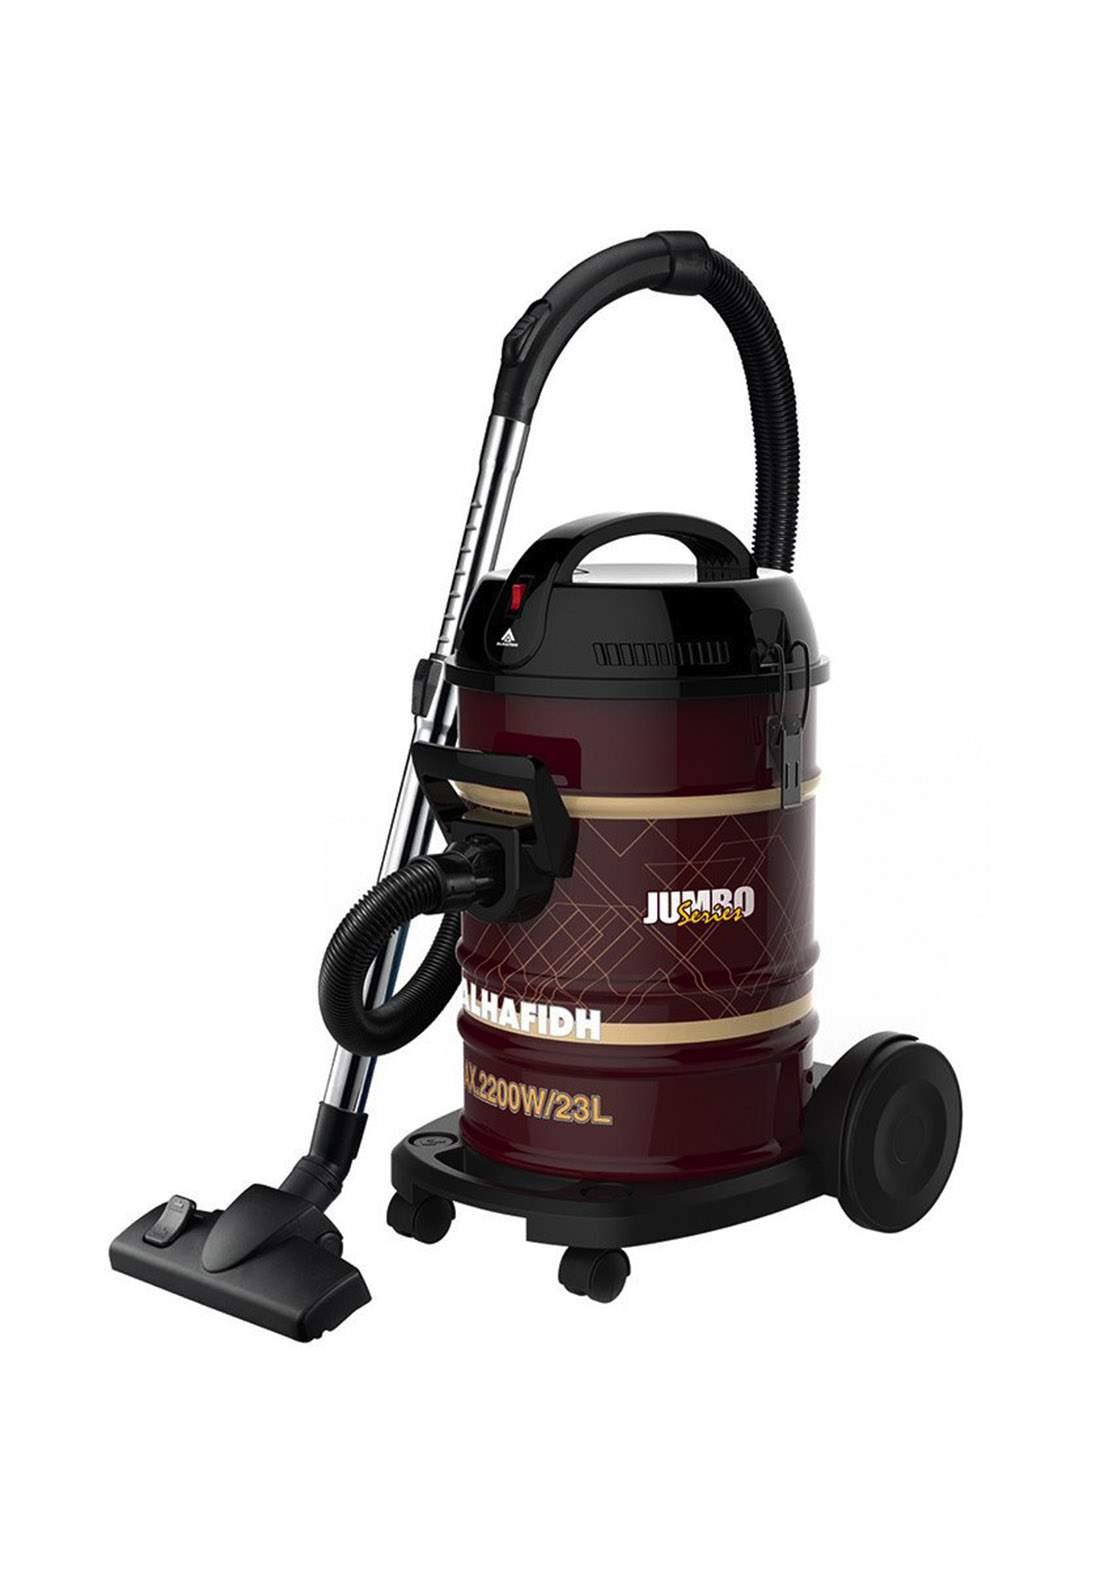 Alhafidh (VCHA-2200D23J3) 23 Liters 2200w Bagged Canister Vacuum Cleaner مكنسة كهربائية